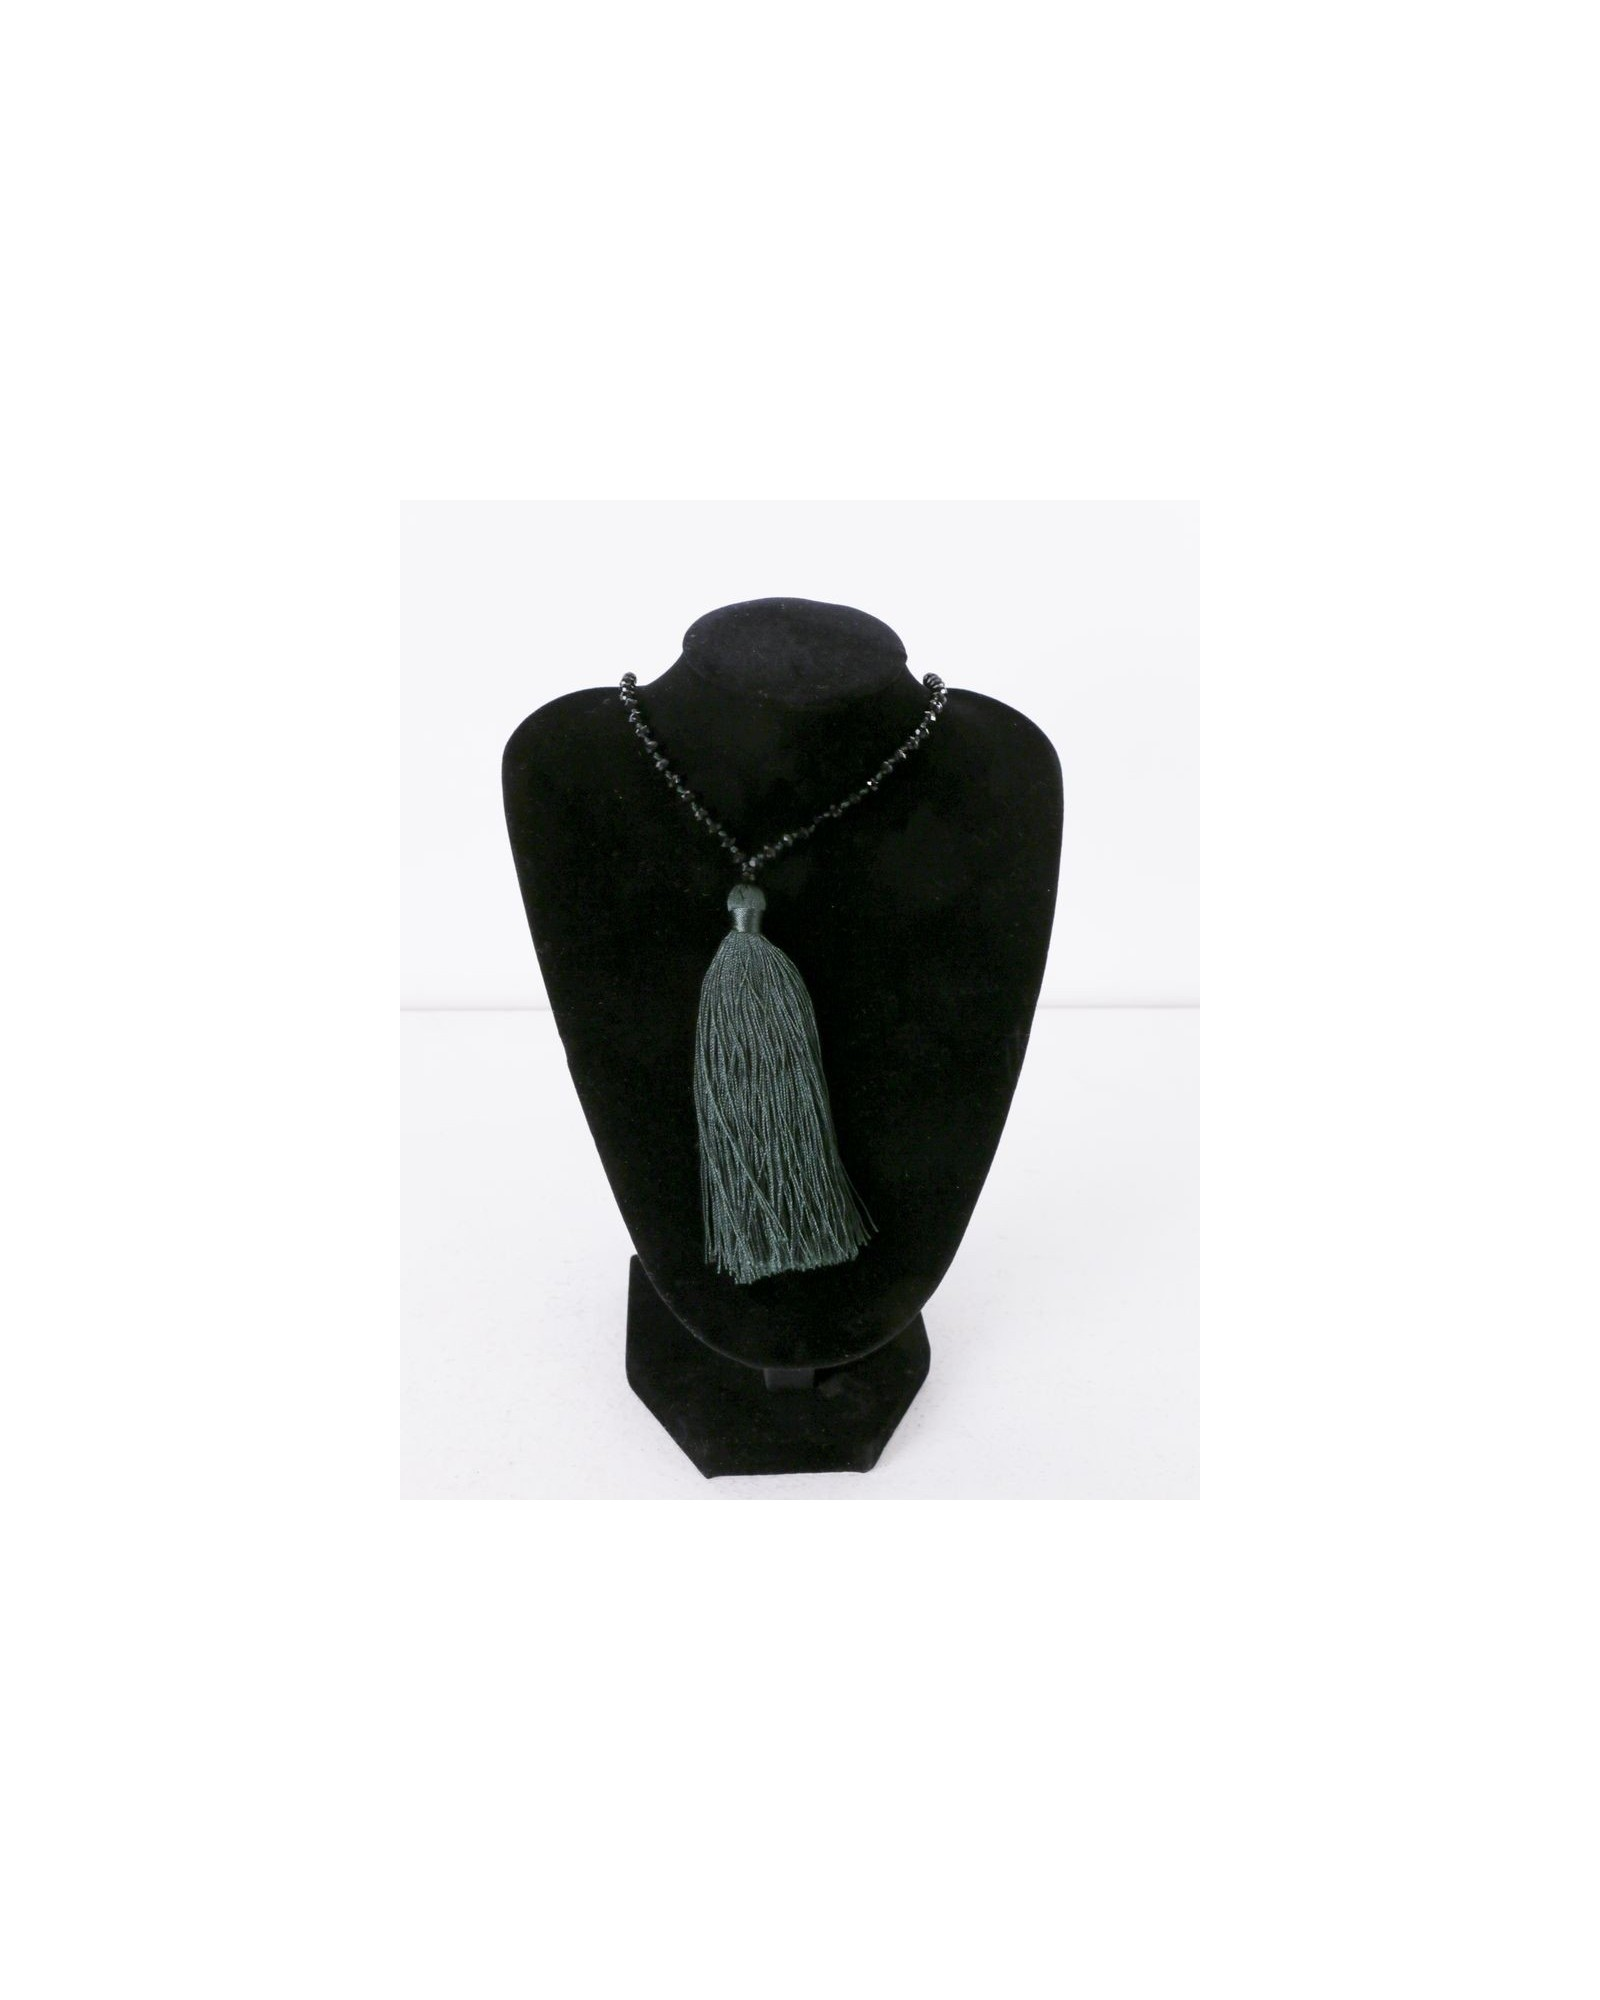 Collier vert à perles noires La Piscine